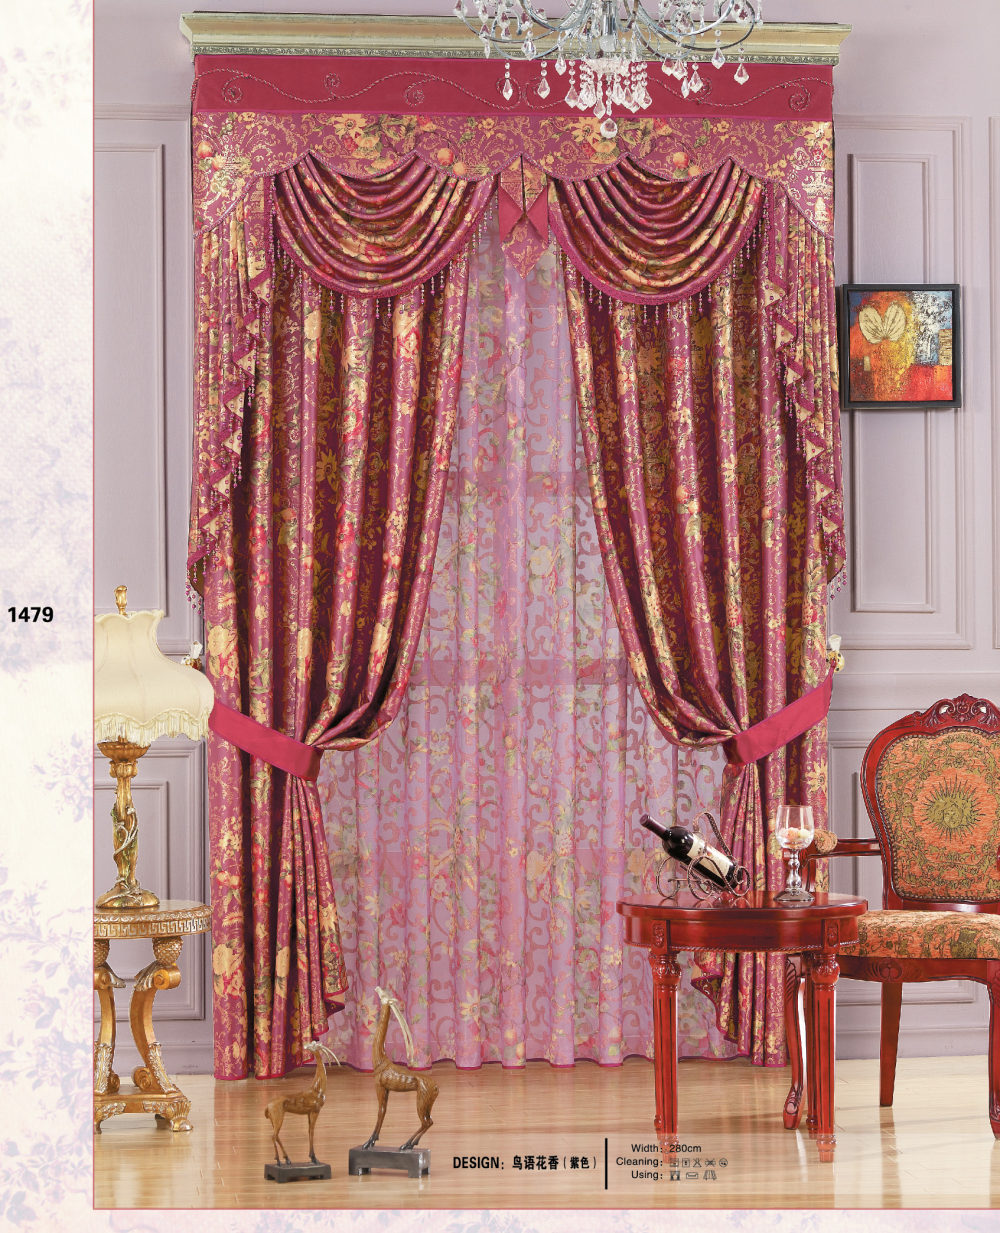 Aiden 收藏窗帘图片高清图(用方案里很清晰。)免费~_13.jpg